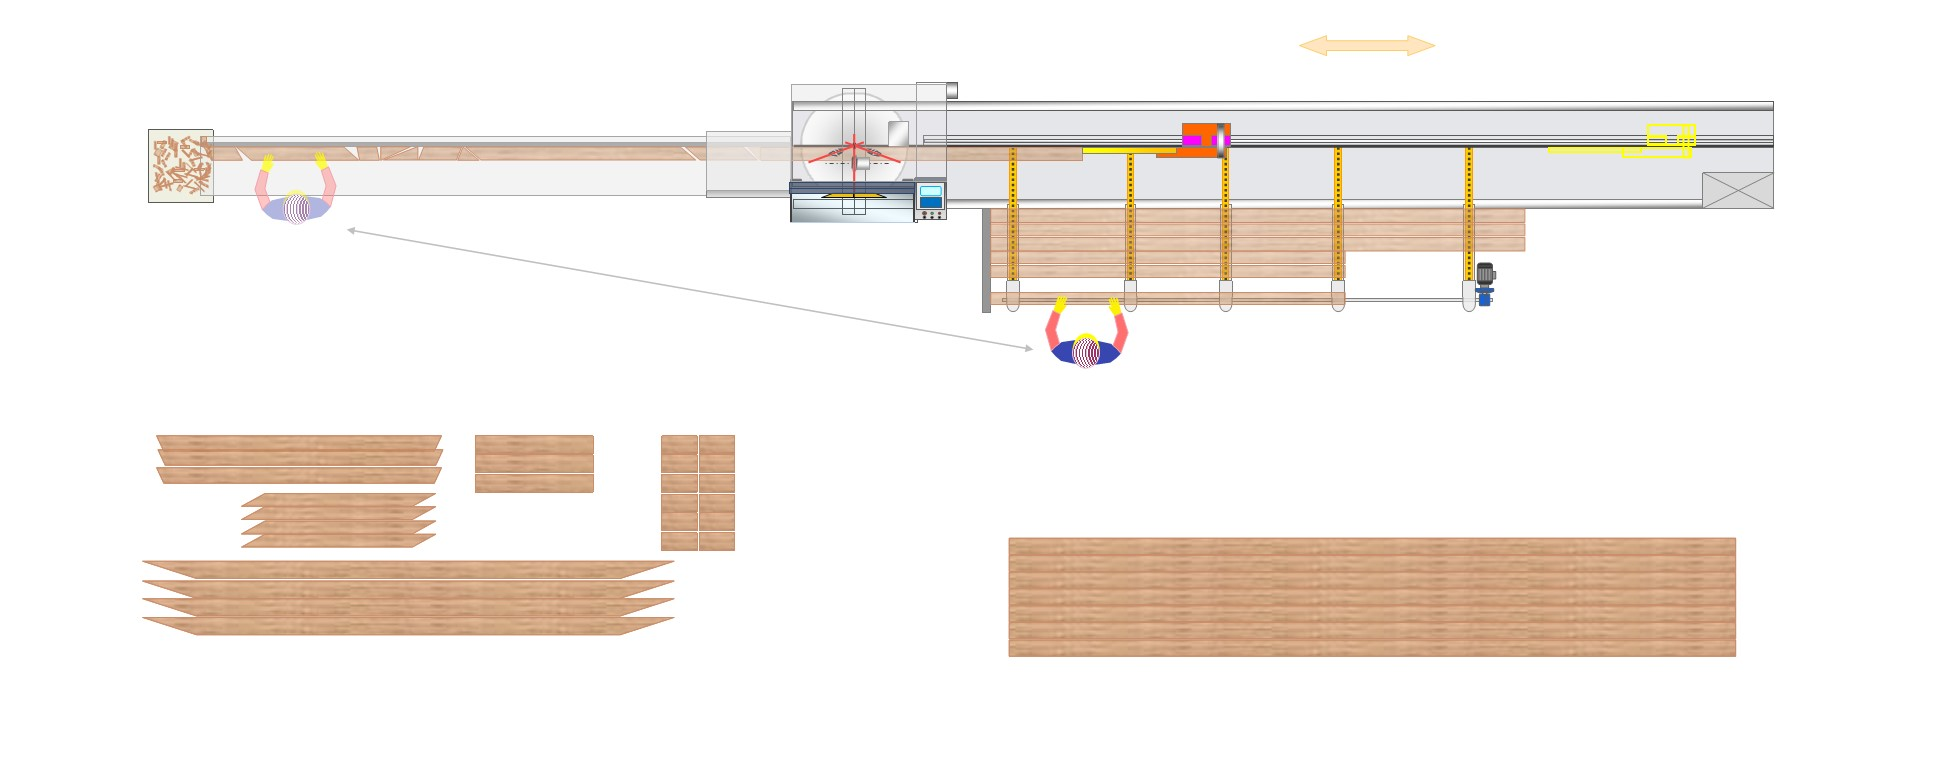 TRGSI - Concept 02